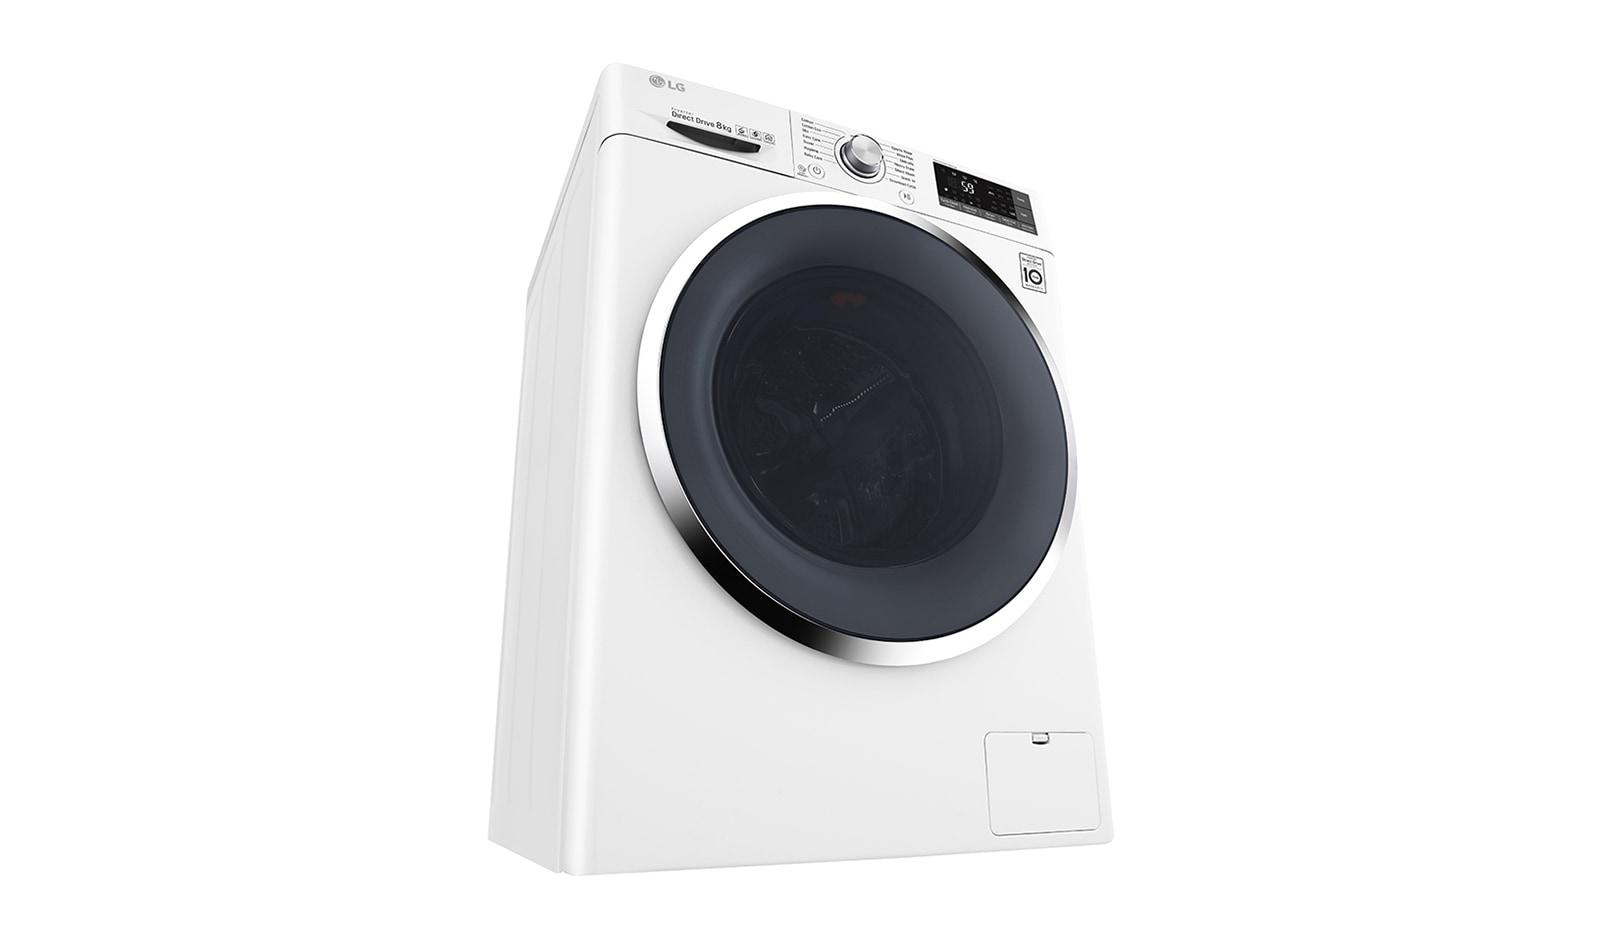 LG Front Load Washing Machines   WD1408NCW 8kg Front Loader   LG Australia